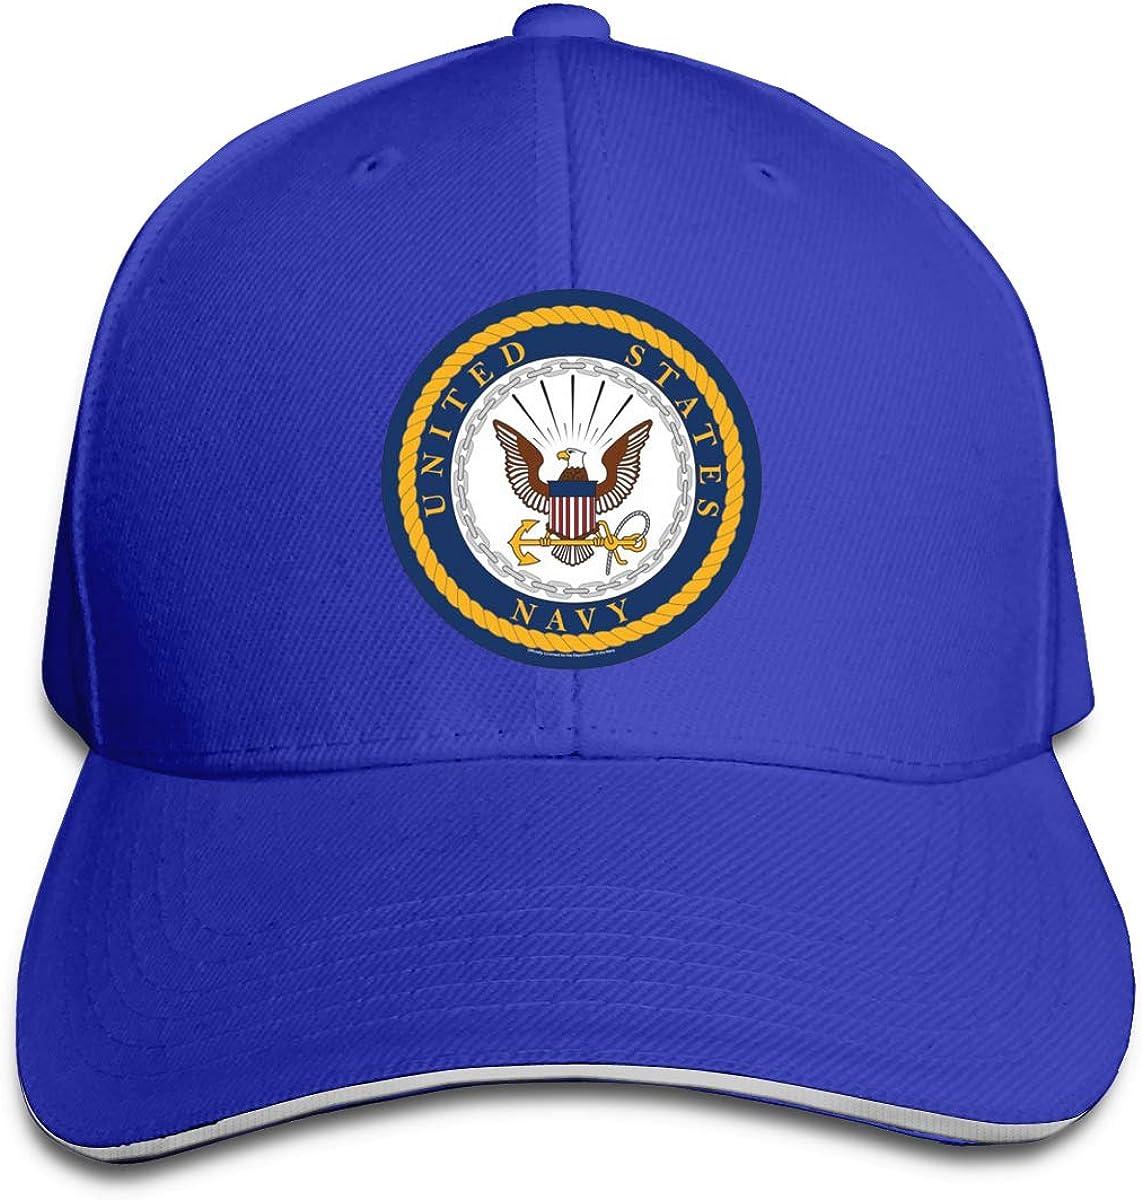 US Navy Seal Unisex Adult Baseball Caps Adjustable Sandwich Caps Jeans Caps Adjustable Denim Trucker Cap